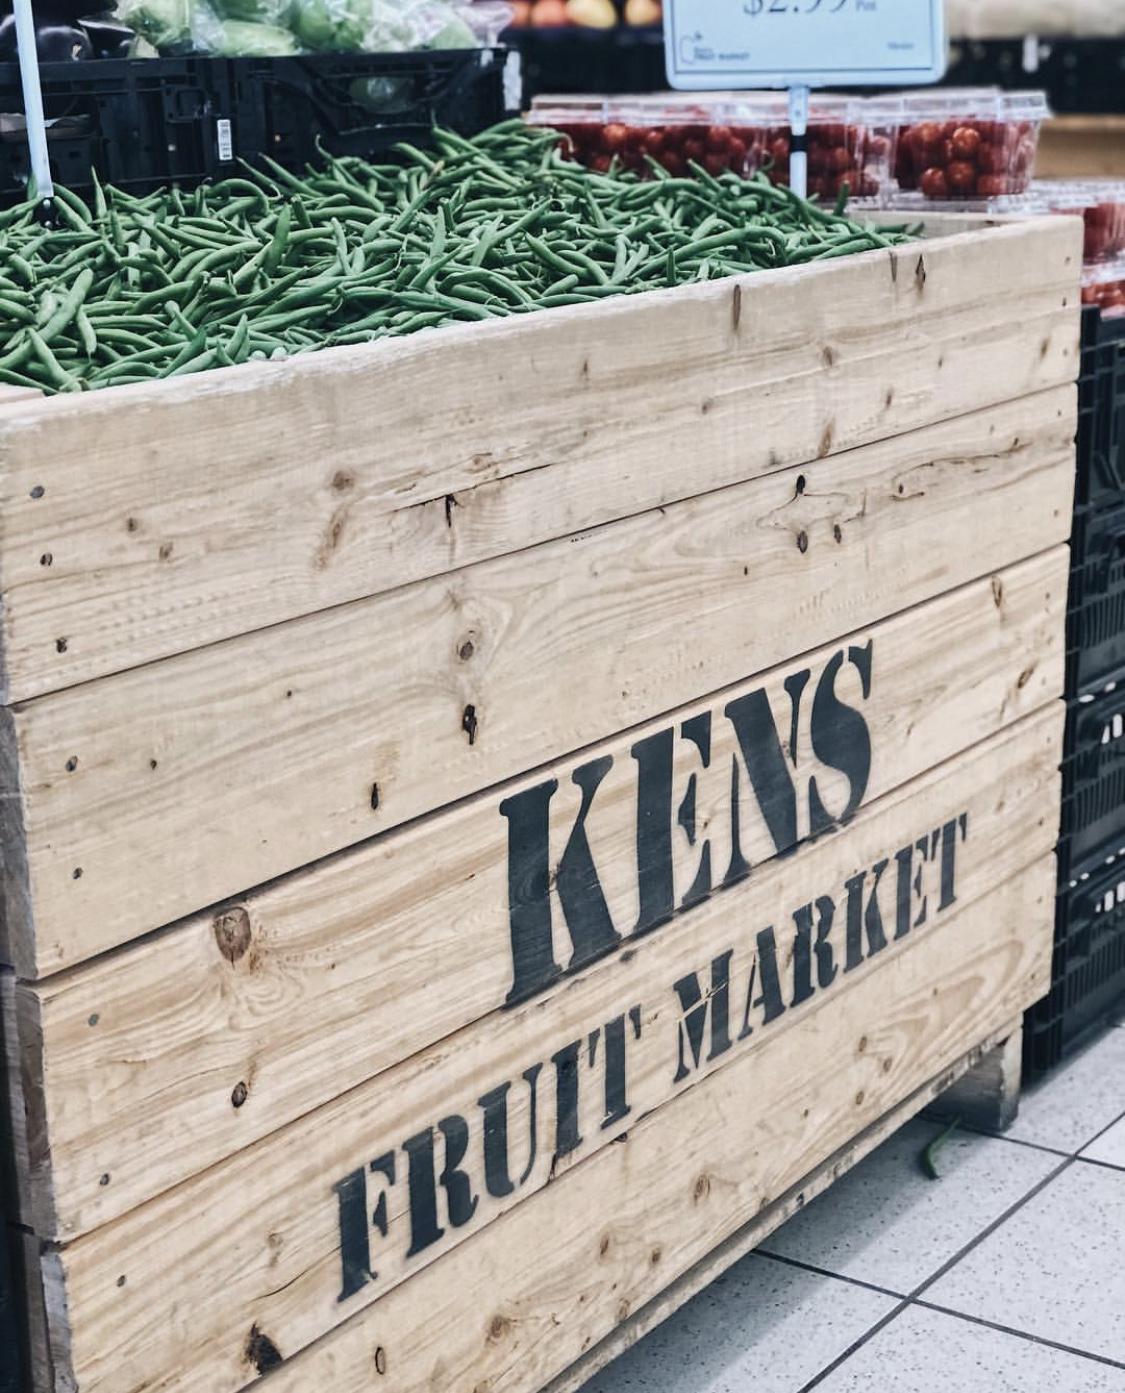 alger heights grand rapids michigan kens market grocery food